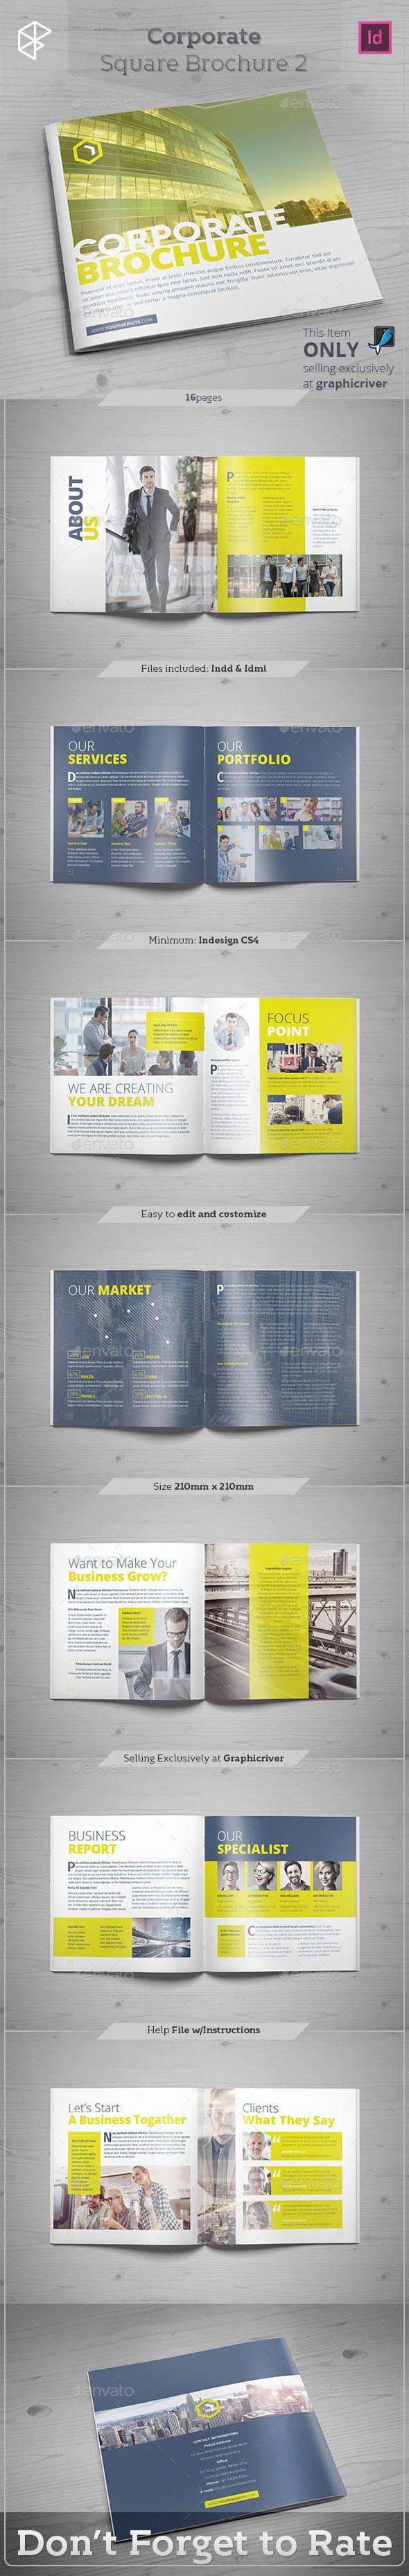 Corporate Square Brochure Template InDesign INDD #design Download ...